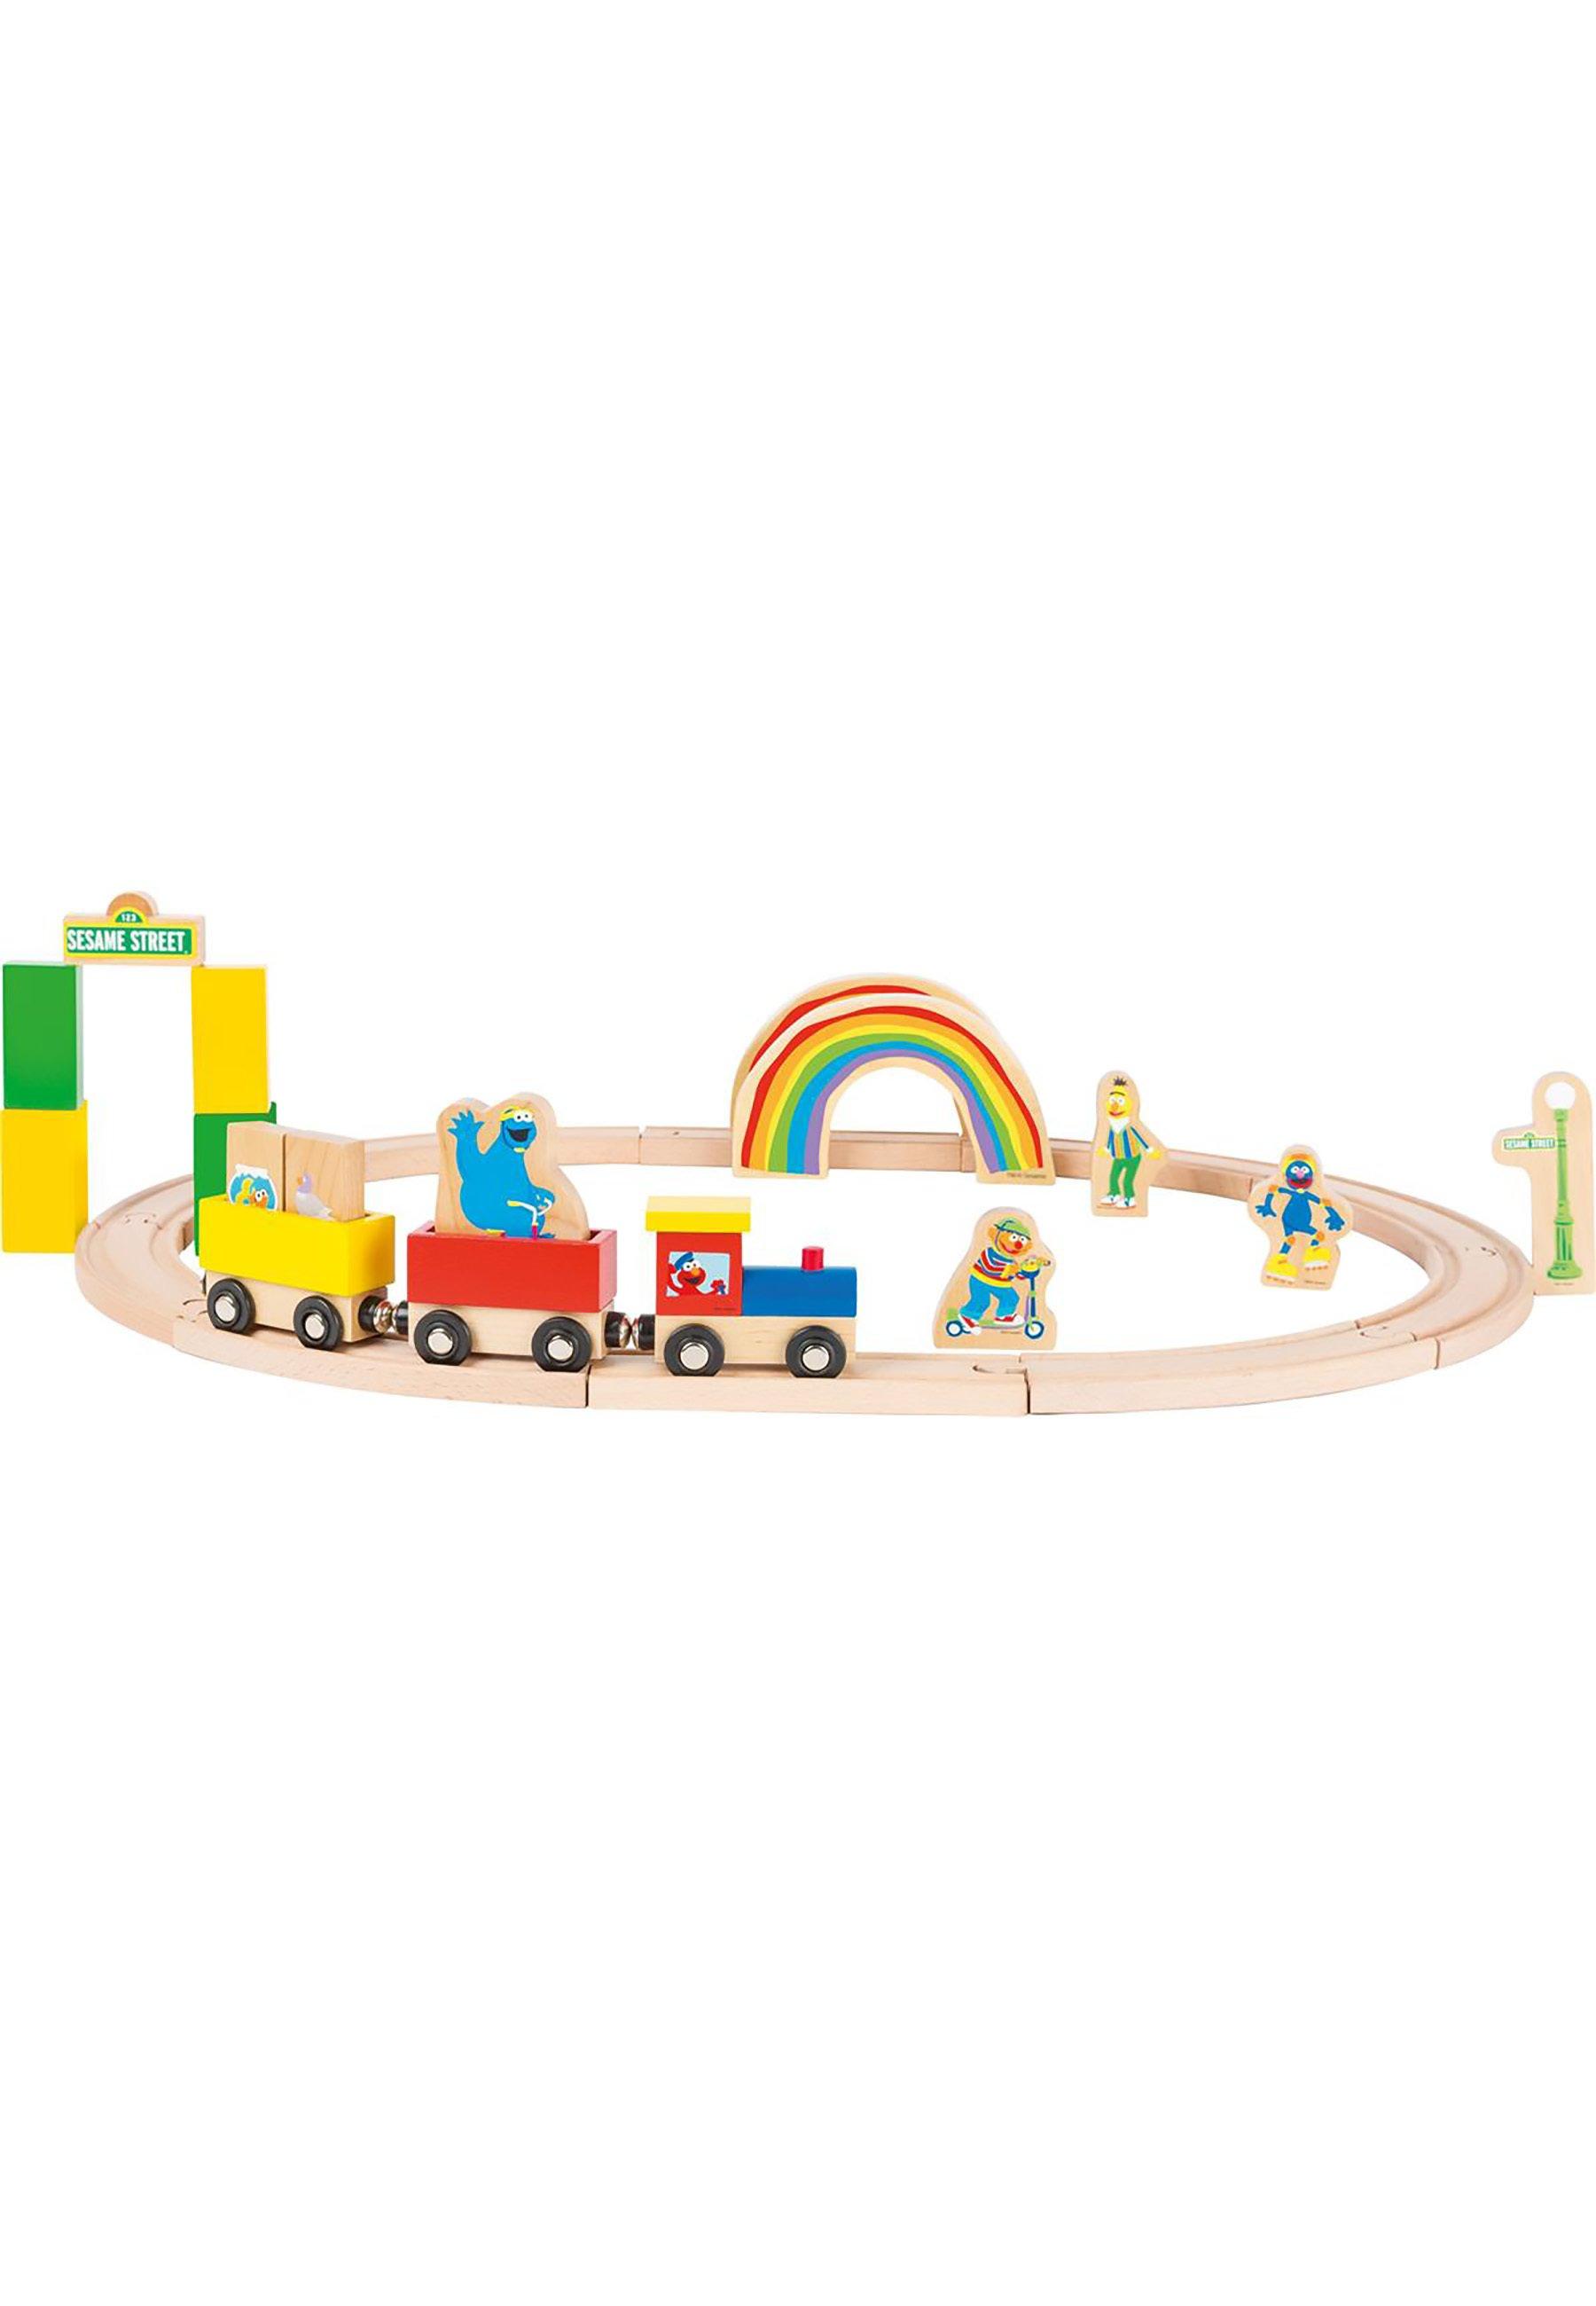 Kinder SESAMSTRASSE  - Spielzeugset Züge